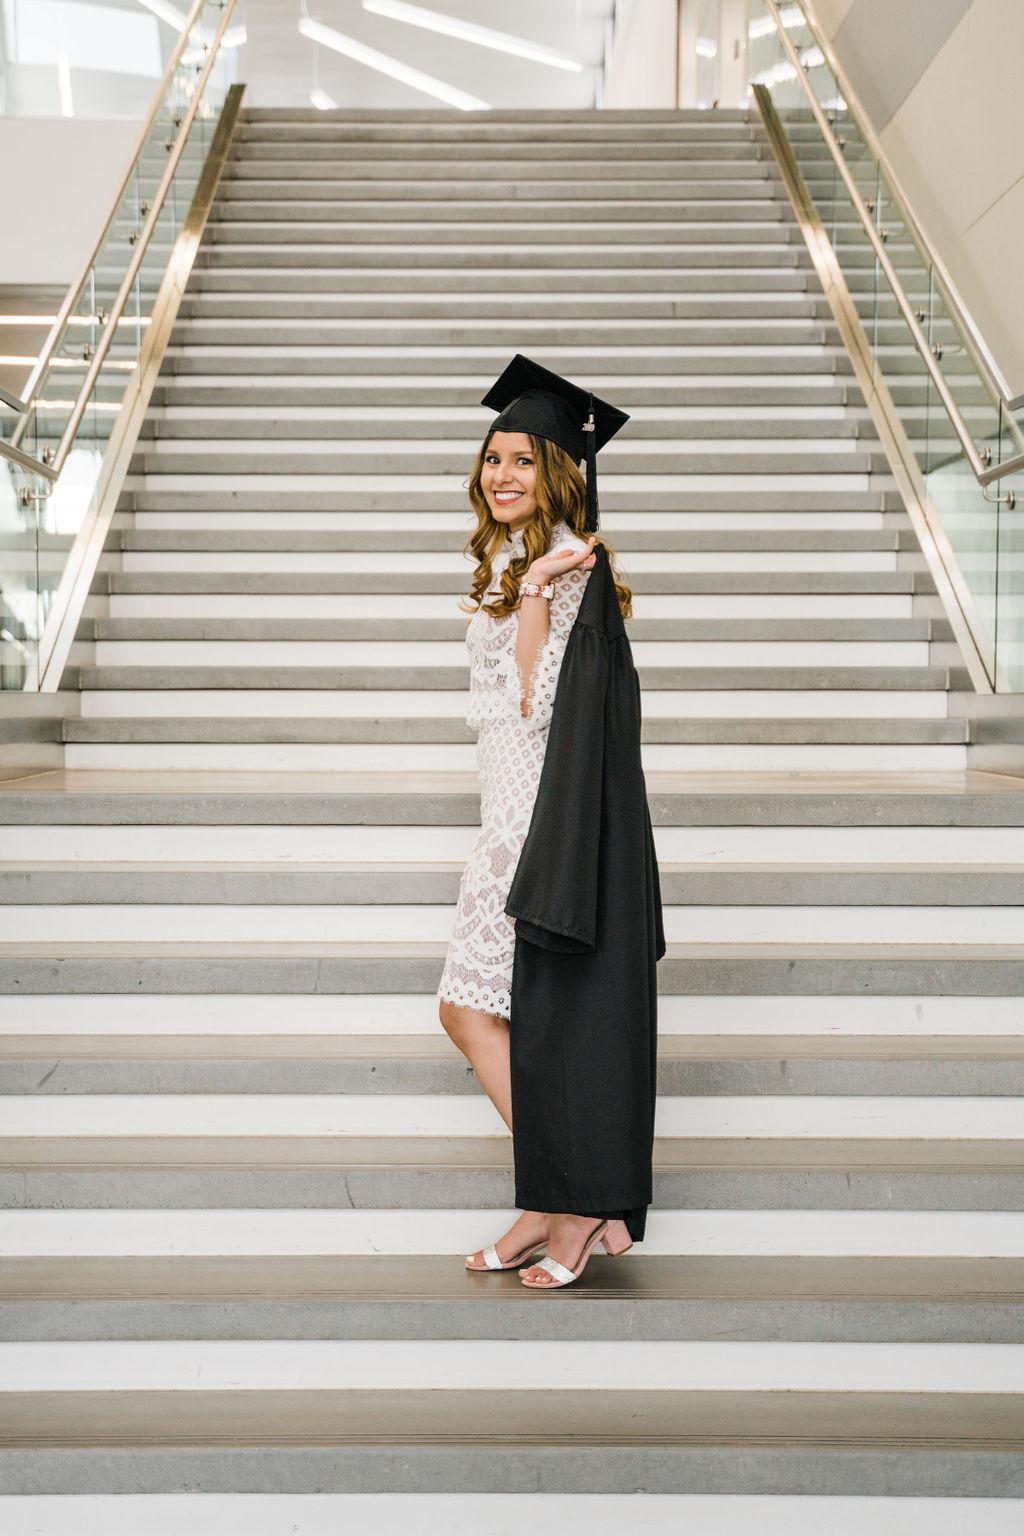 Maria BYU-Idaho Graduation Photos Christine Madeux Photography Rexburg Idaho Photographer